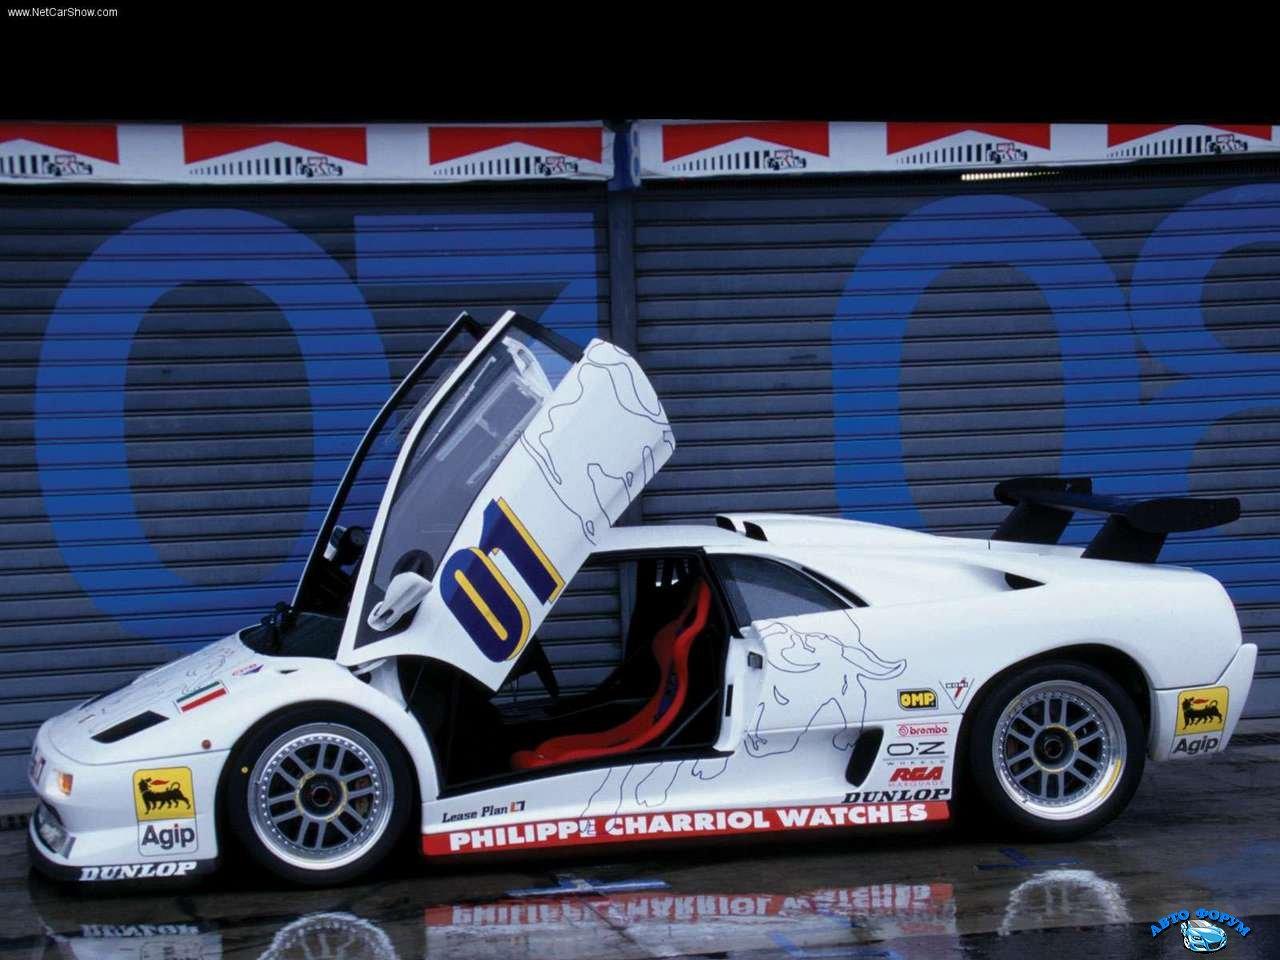 Lamborghini-Diablo_SVR_1996_1280x960_wallpaper_04.jpg